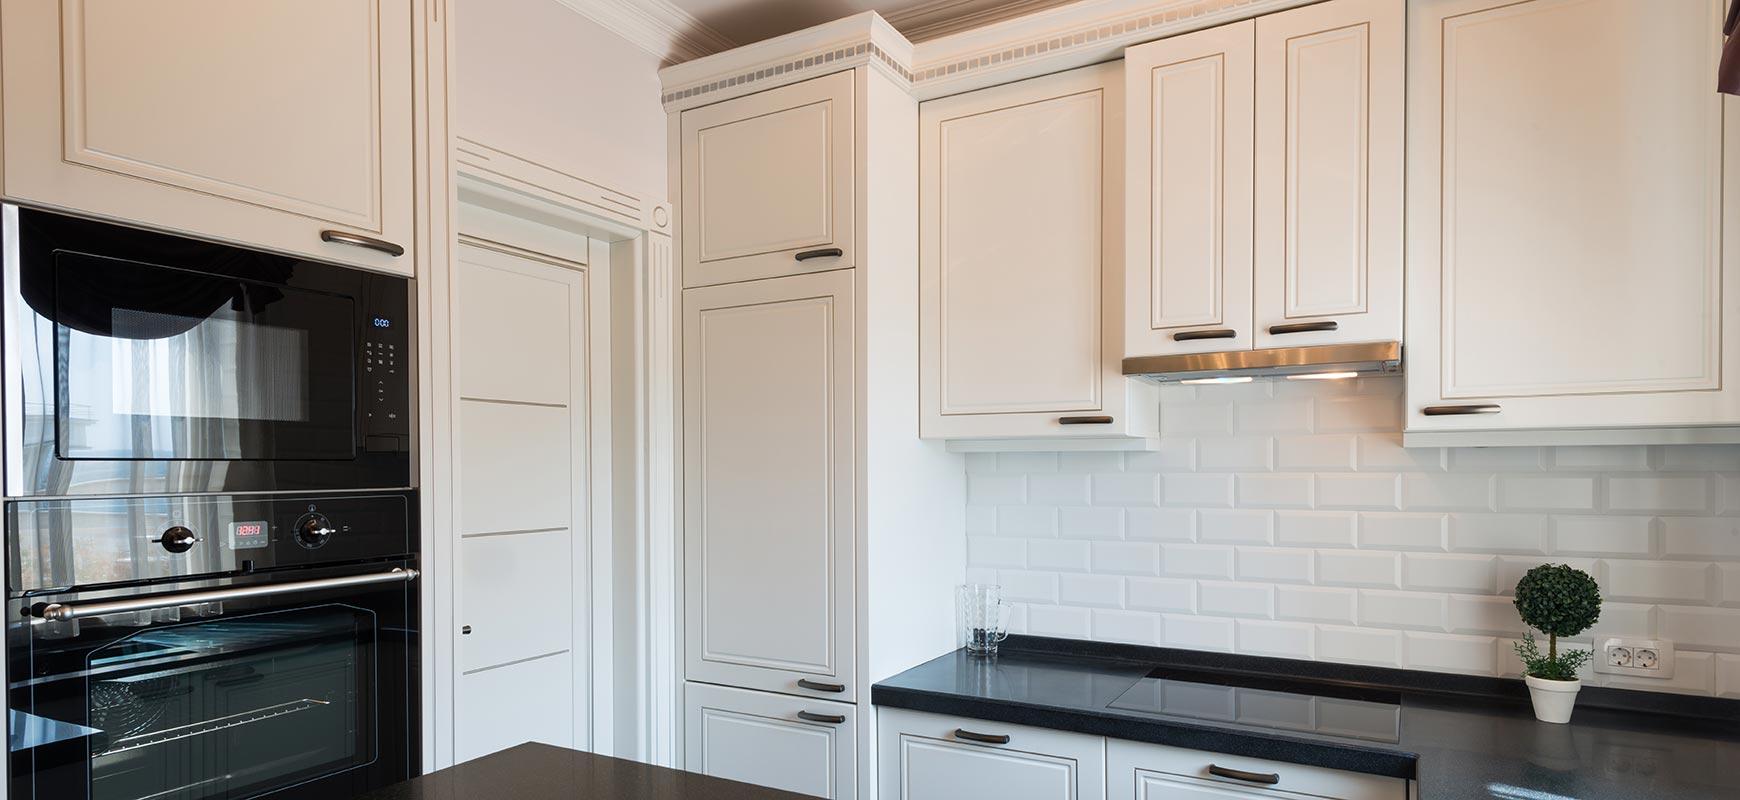 Naples, FL Kitchen Cabinet Painting